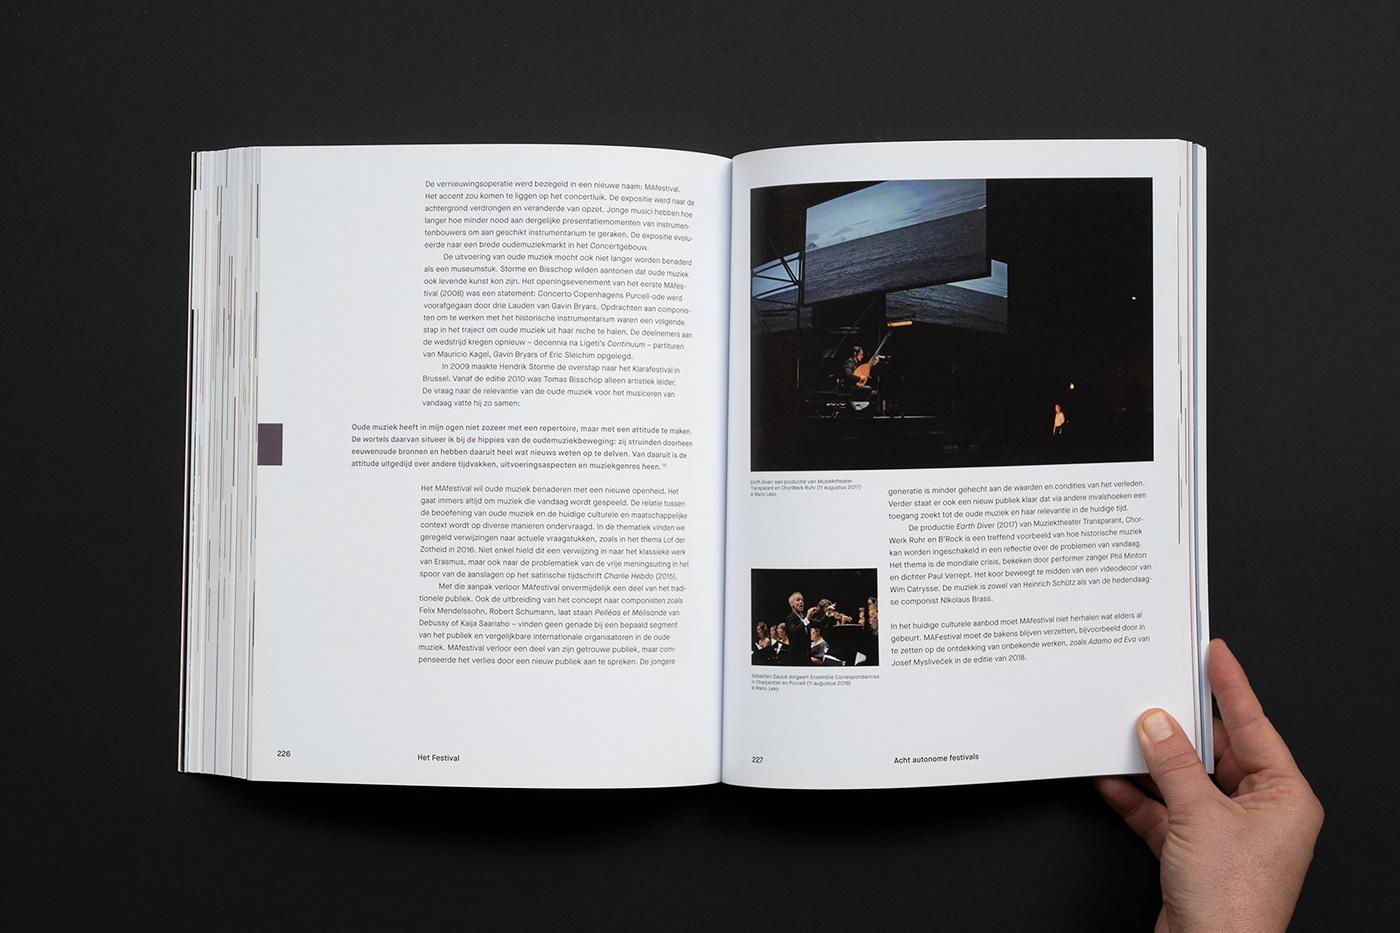 Image may contain: book, screenshot and person